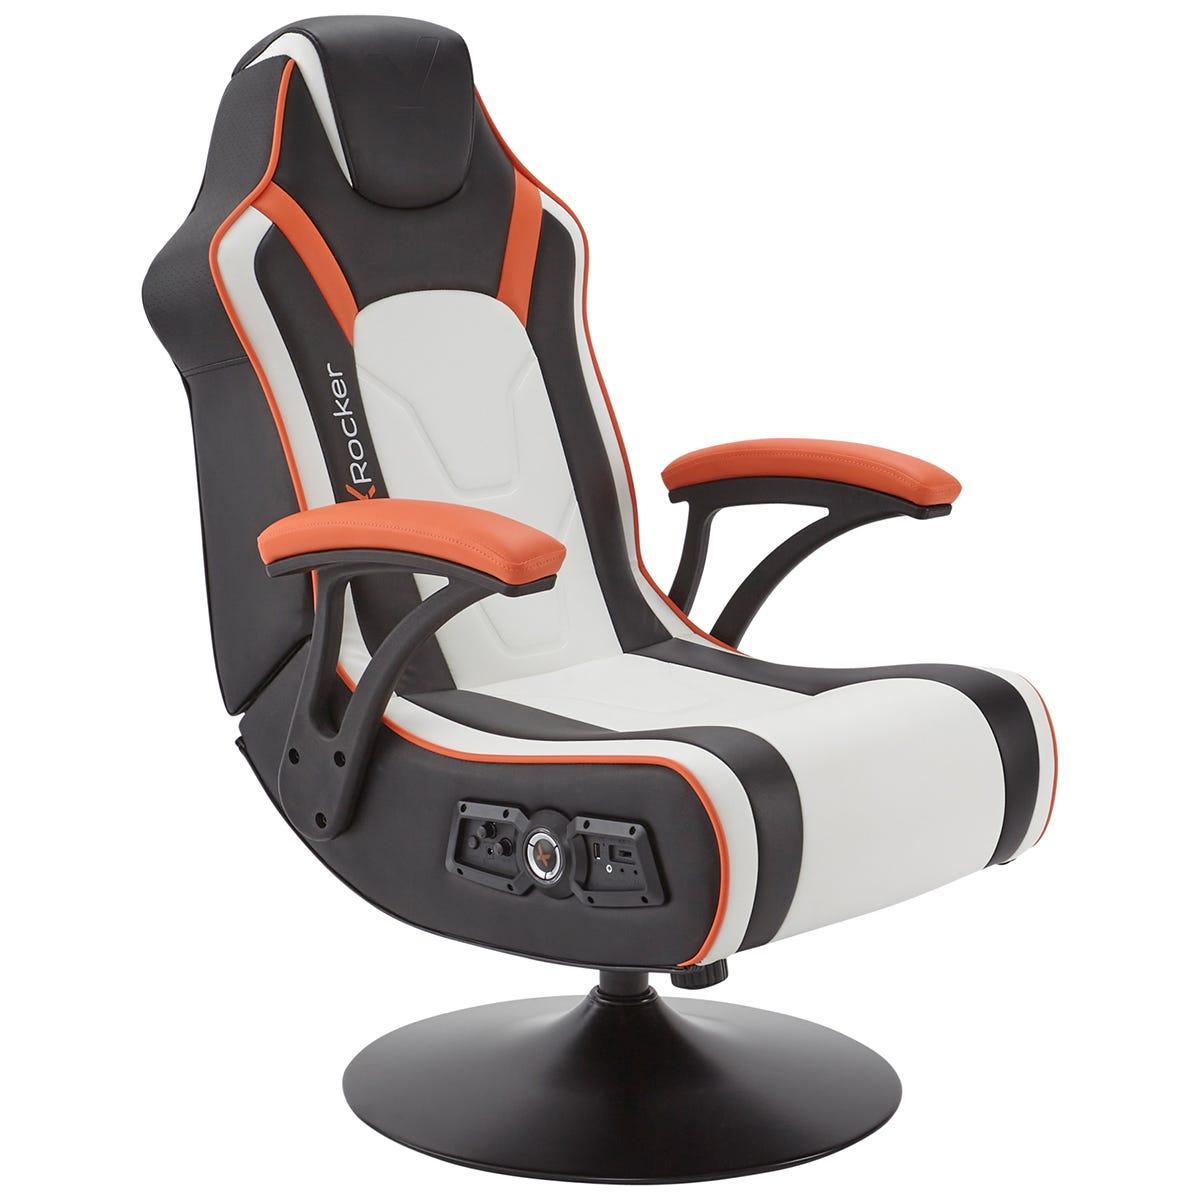 X Rocker X-Rocker Torque 2.1 DAC Pedestal Gaming Chair - White/Black/Orange